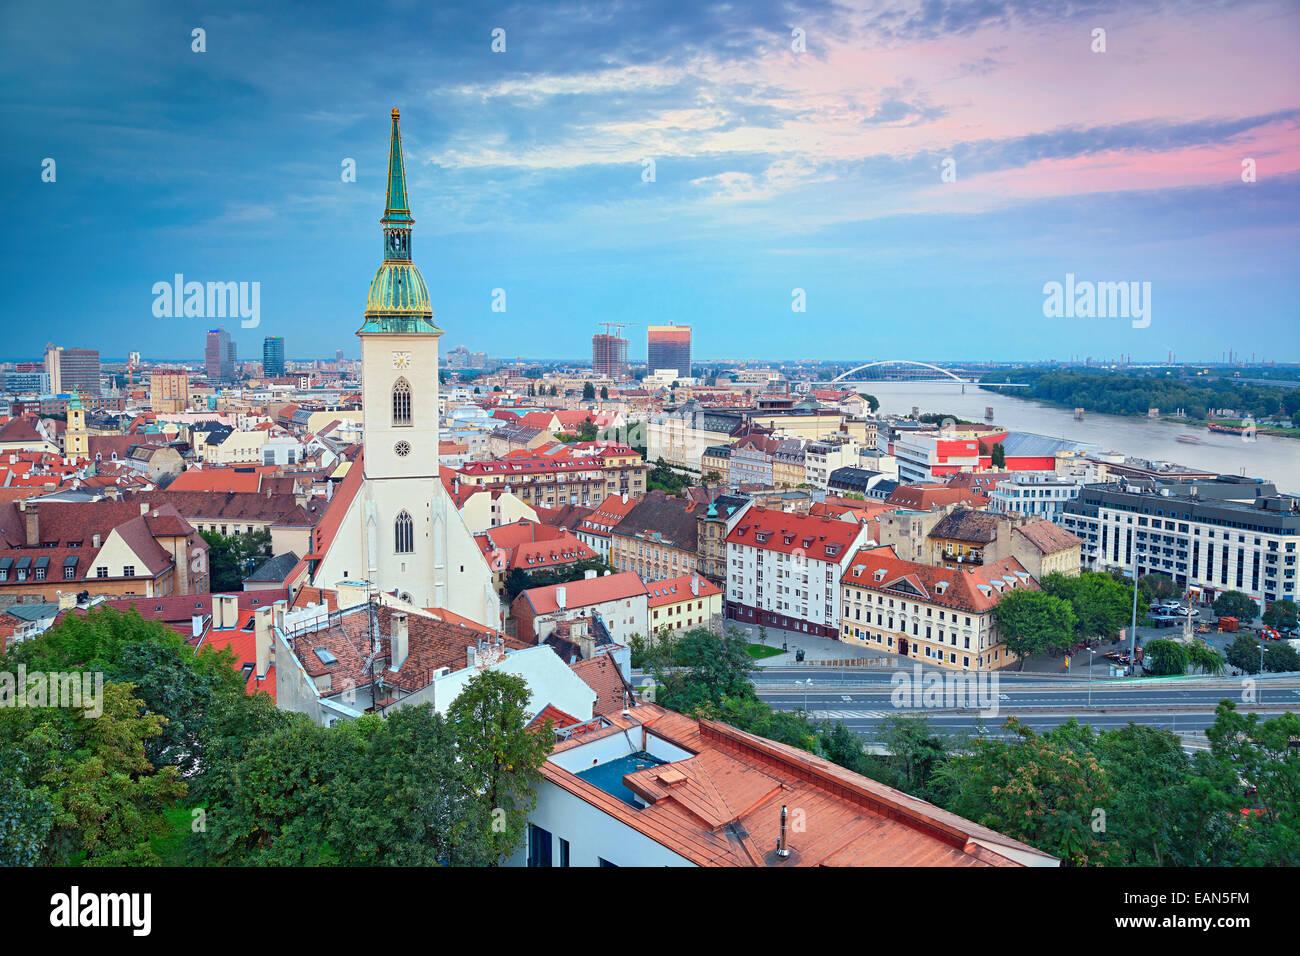 Image of Bratislava, the capital city of Slovak Republic. - Stock Image